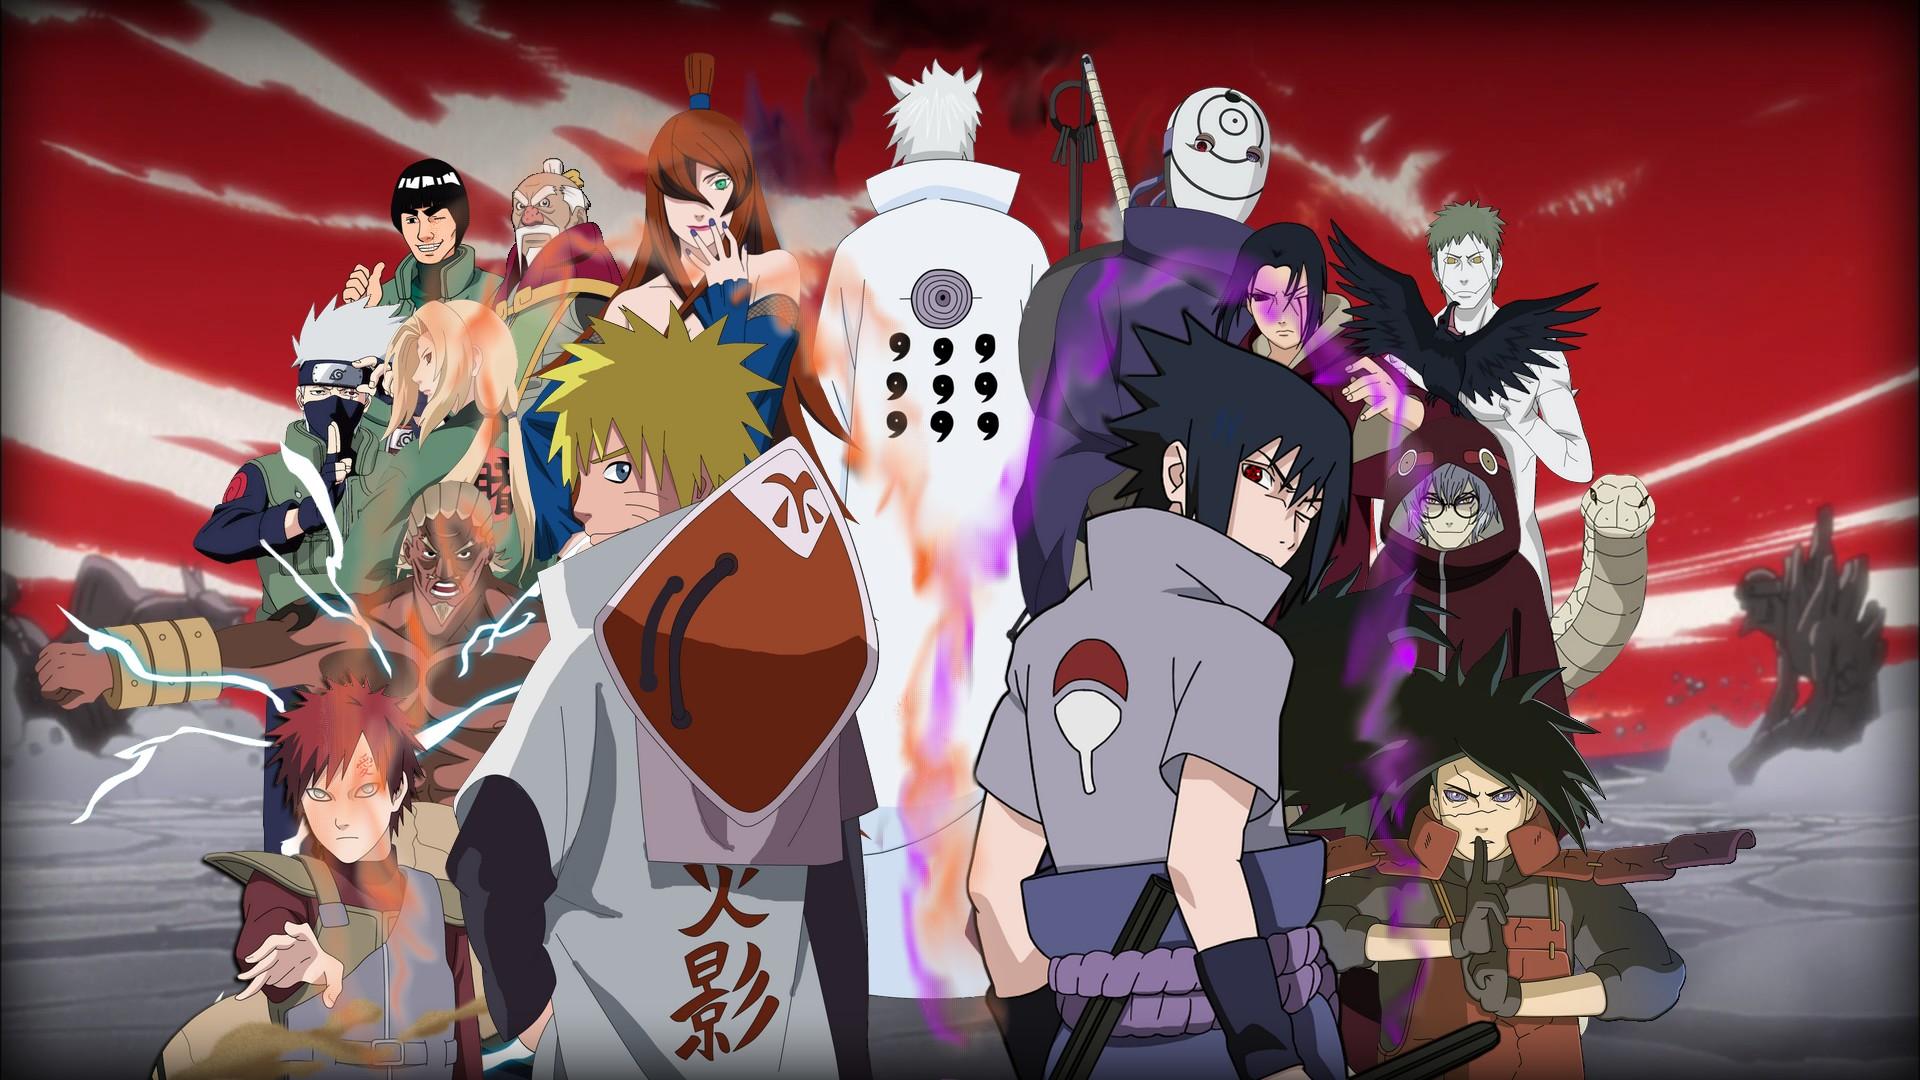 Naruto Shippuden wallpaper Download free cool